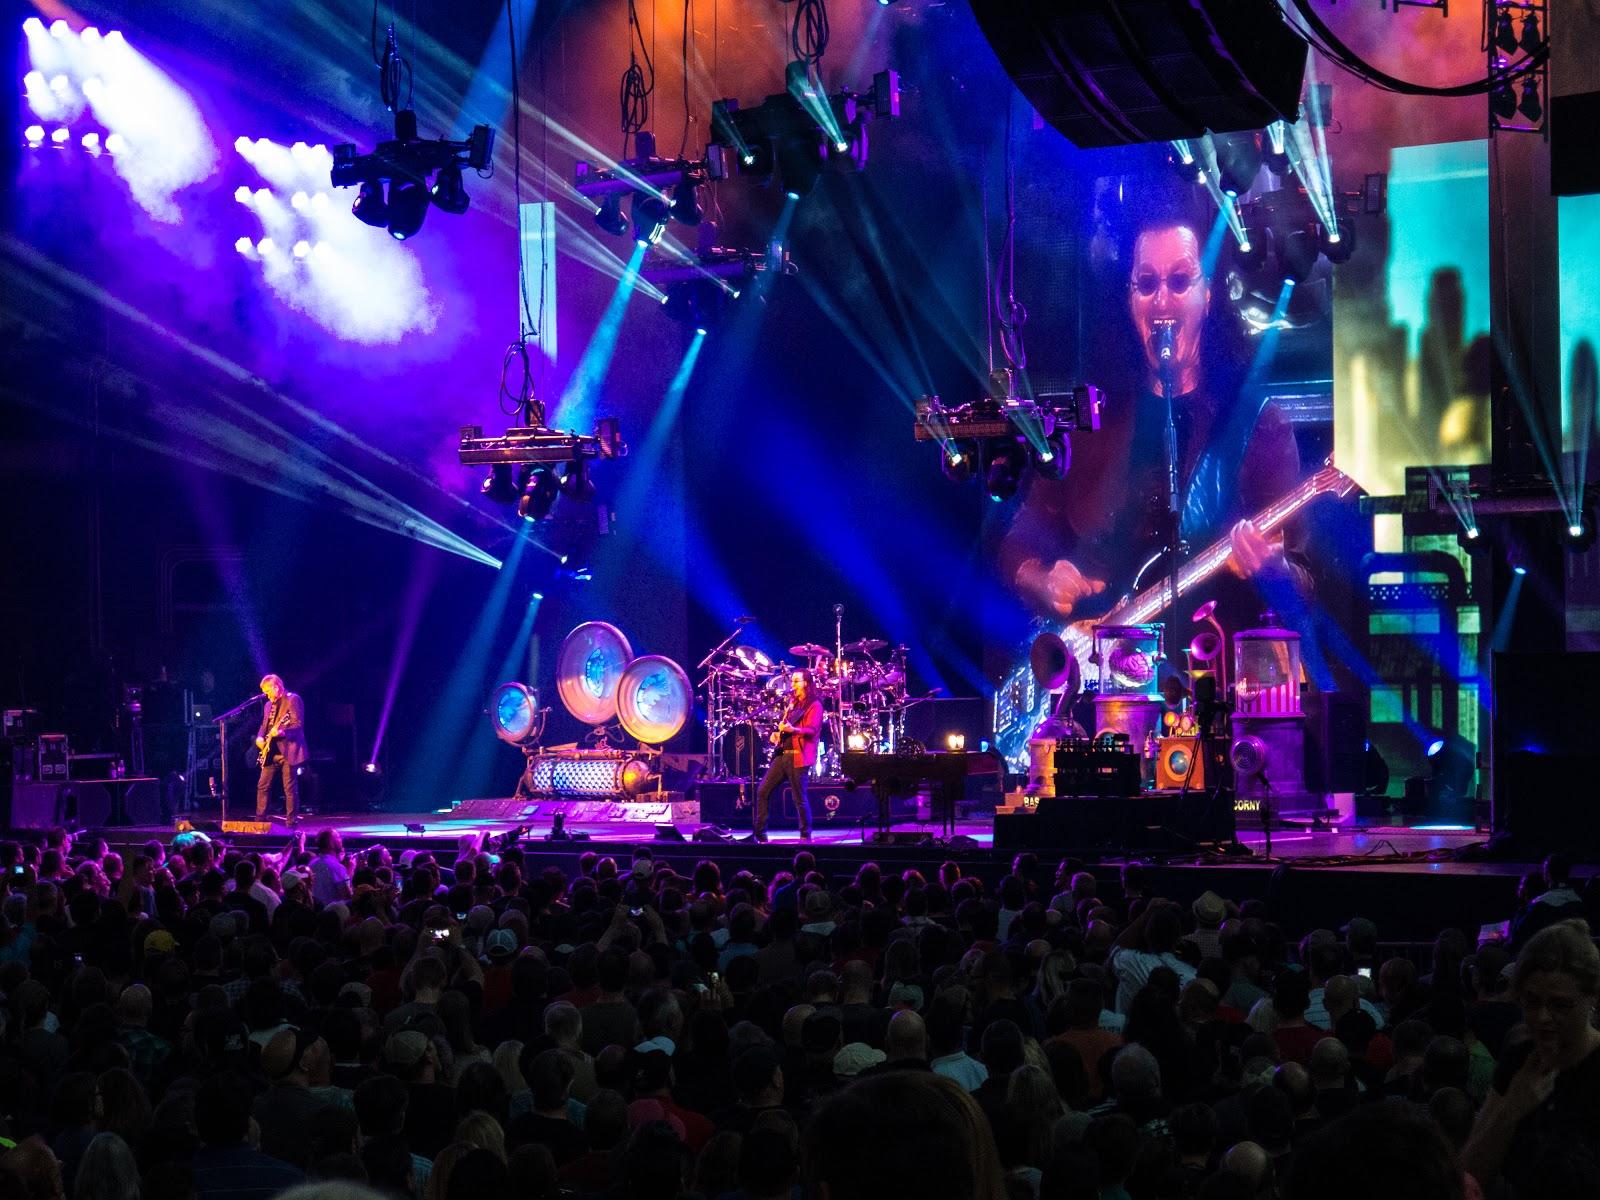 Rush Live Wallpaper Larger Than Life